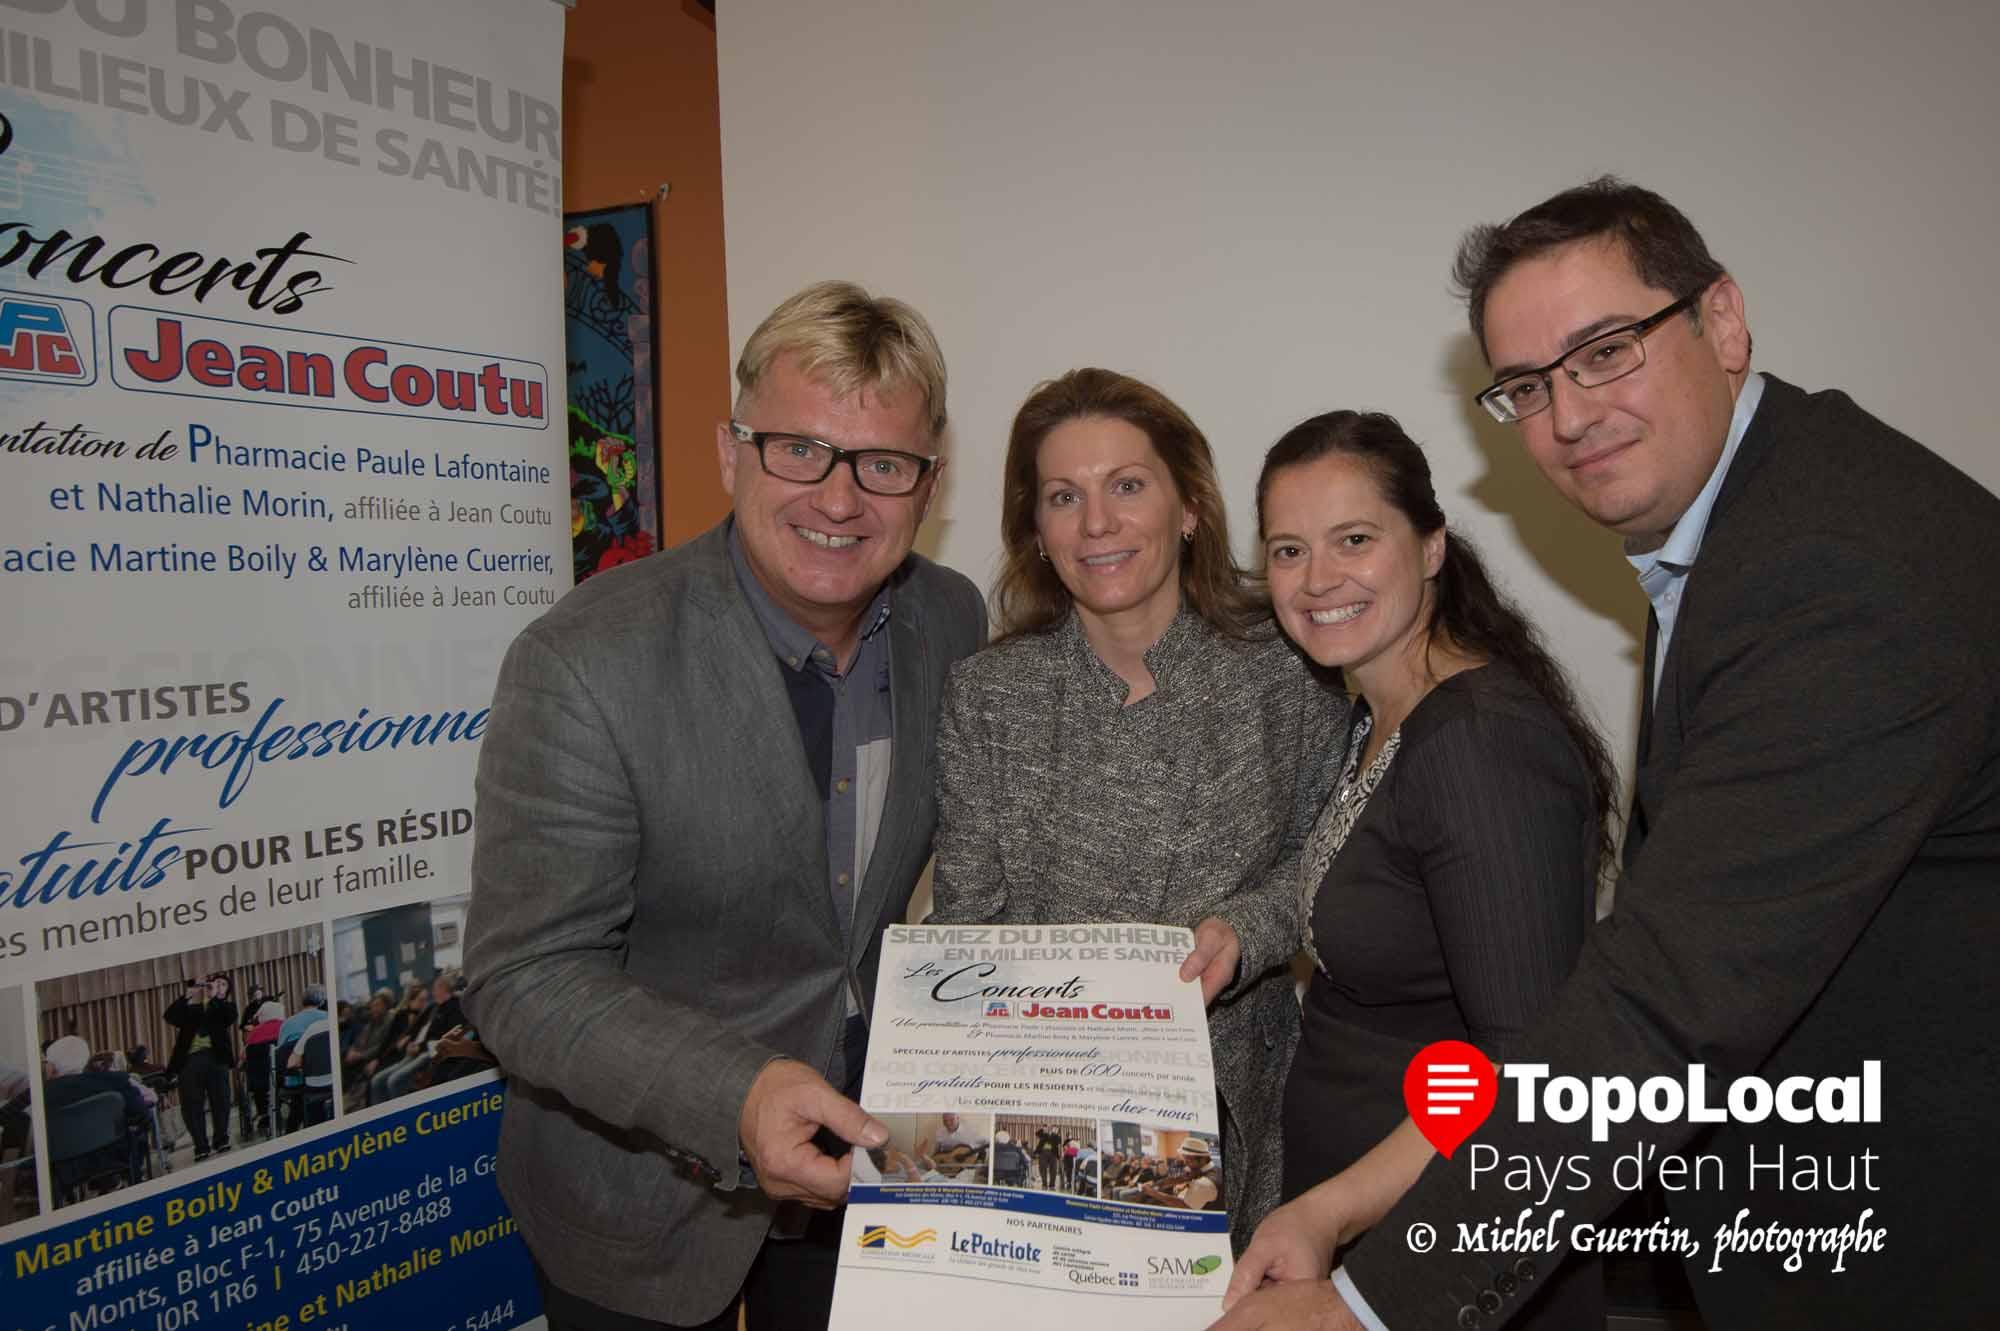 20161012-sainte-agathe-patriote-fondation-medicale-jean-coutu